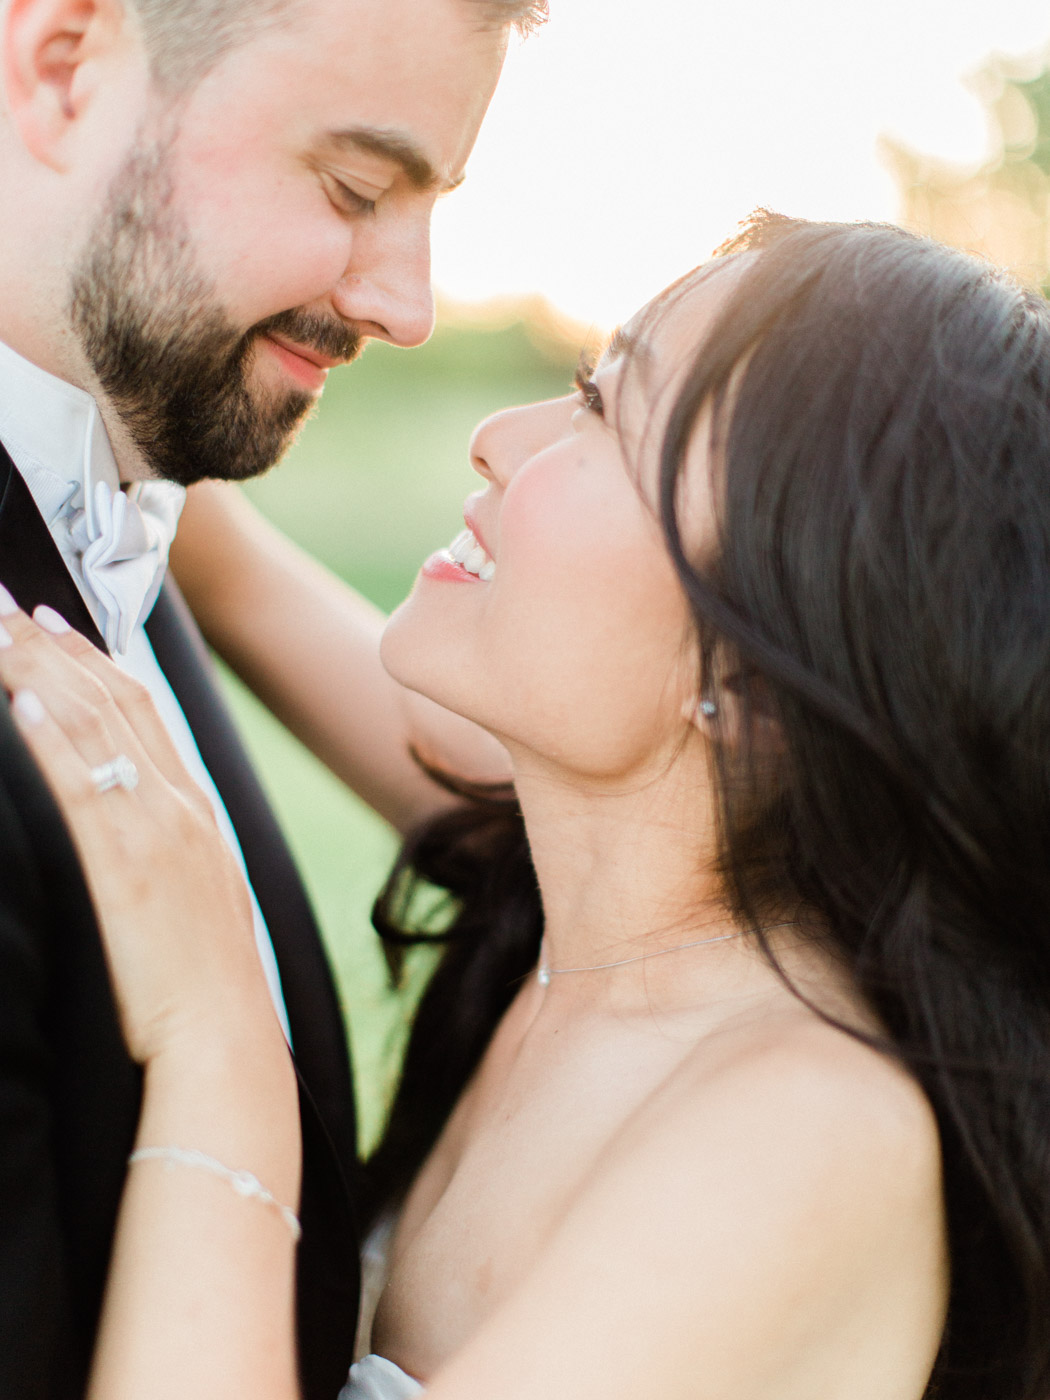 Toronto-Collingwood-Muskoka-Wedding-photographer-how-to-capture-great-couples-photos-on-your-wedding-day7.jpg